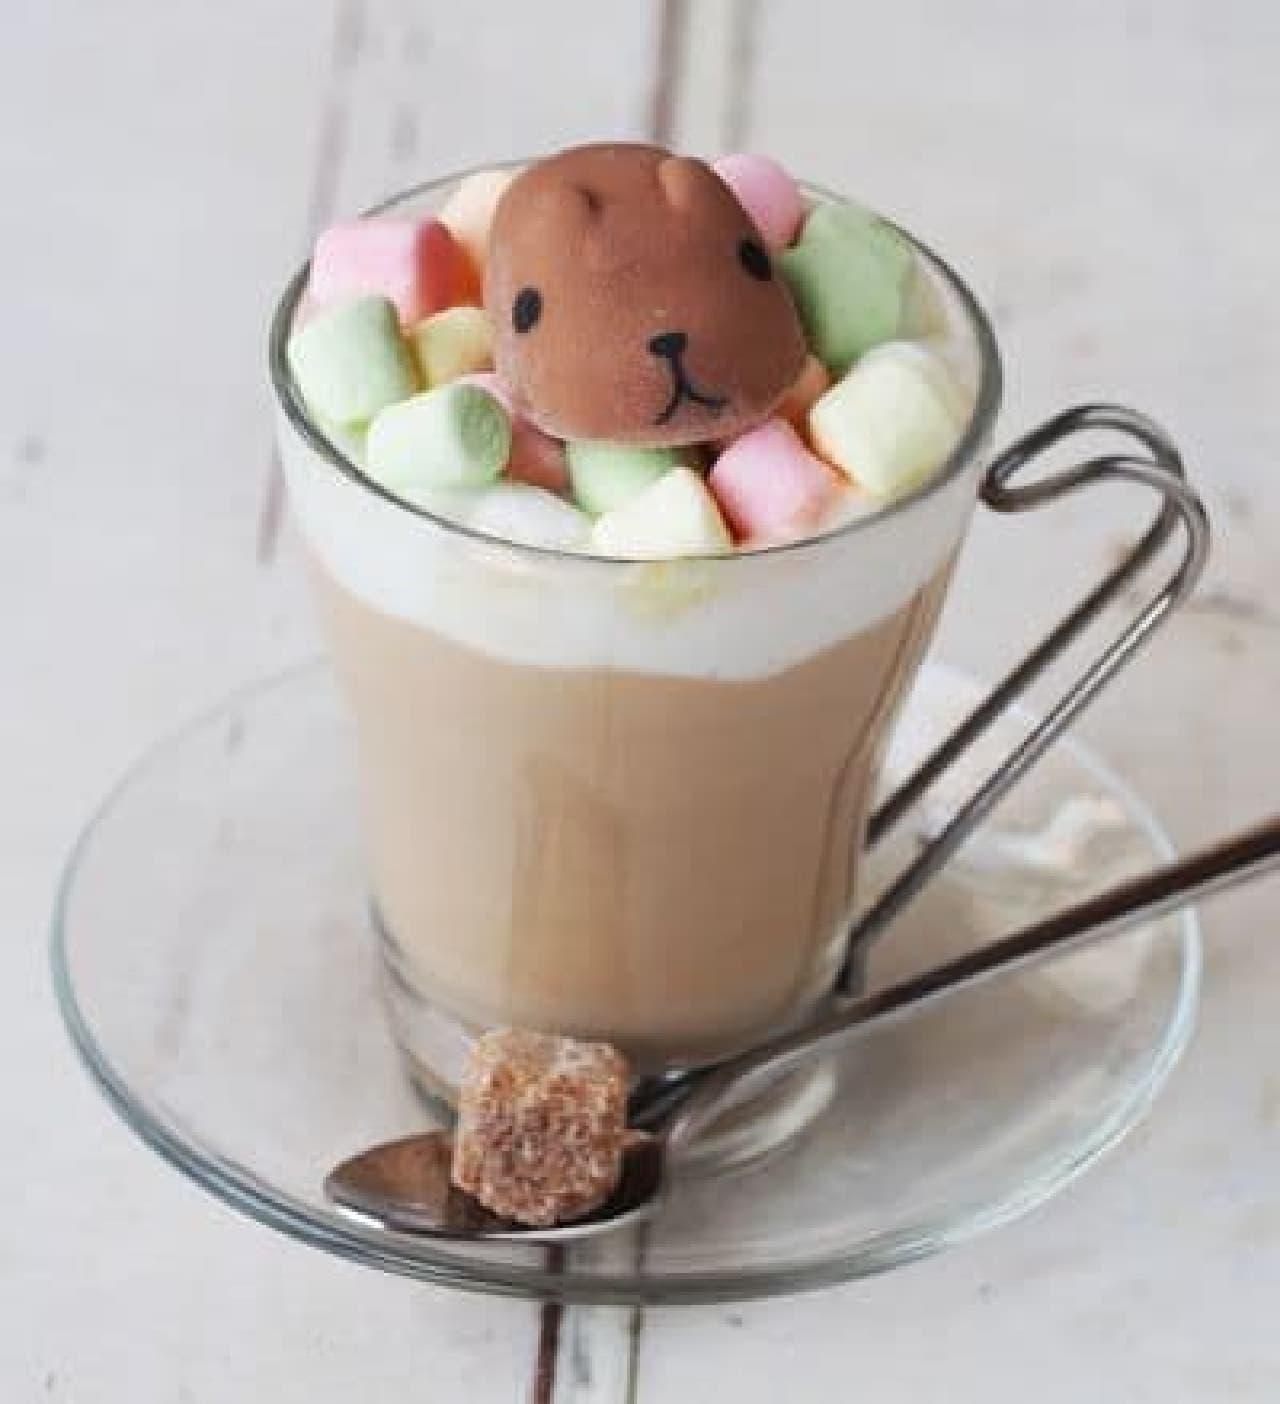 KAPIBARASAN×HANDS CAFE「カピバラさんのましゅまろ~んカフェオレ」